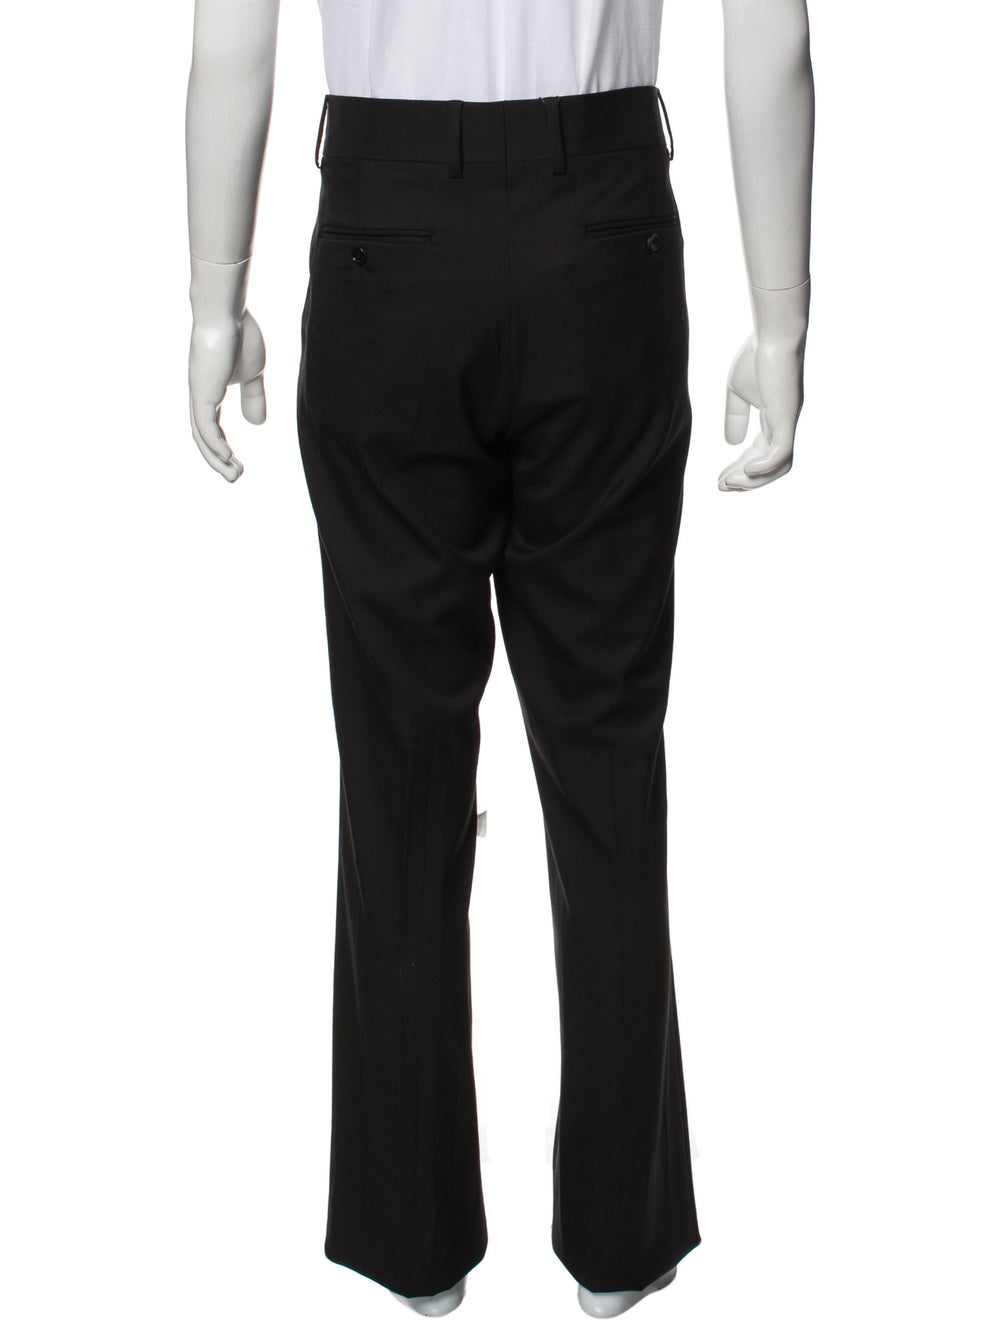 Gucci 70's Dress Pants w/ Tags Black - image 3